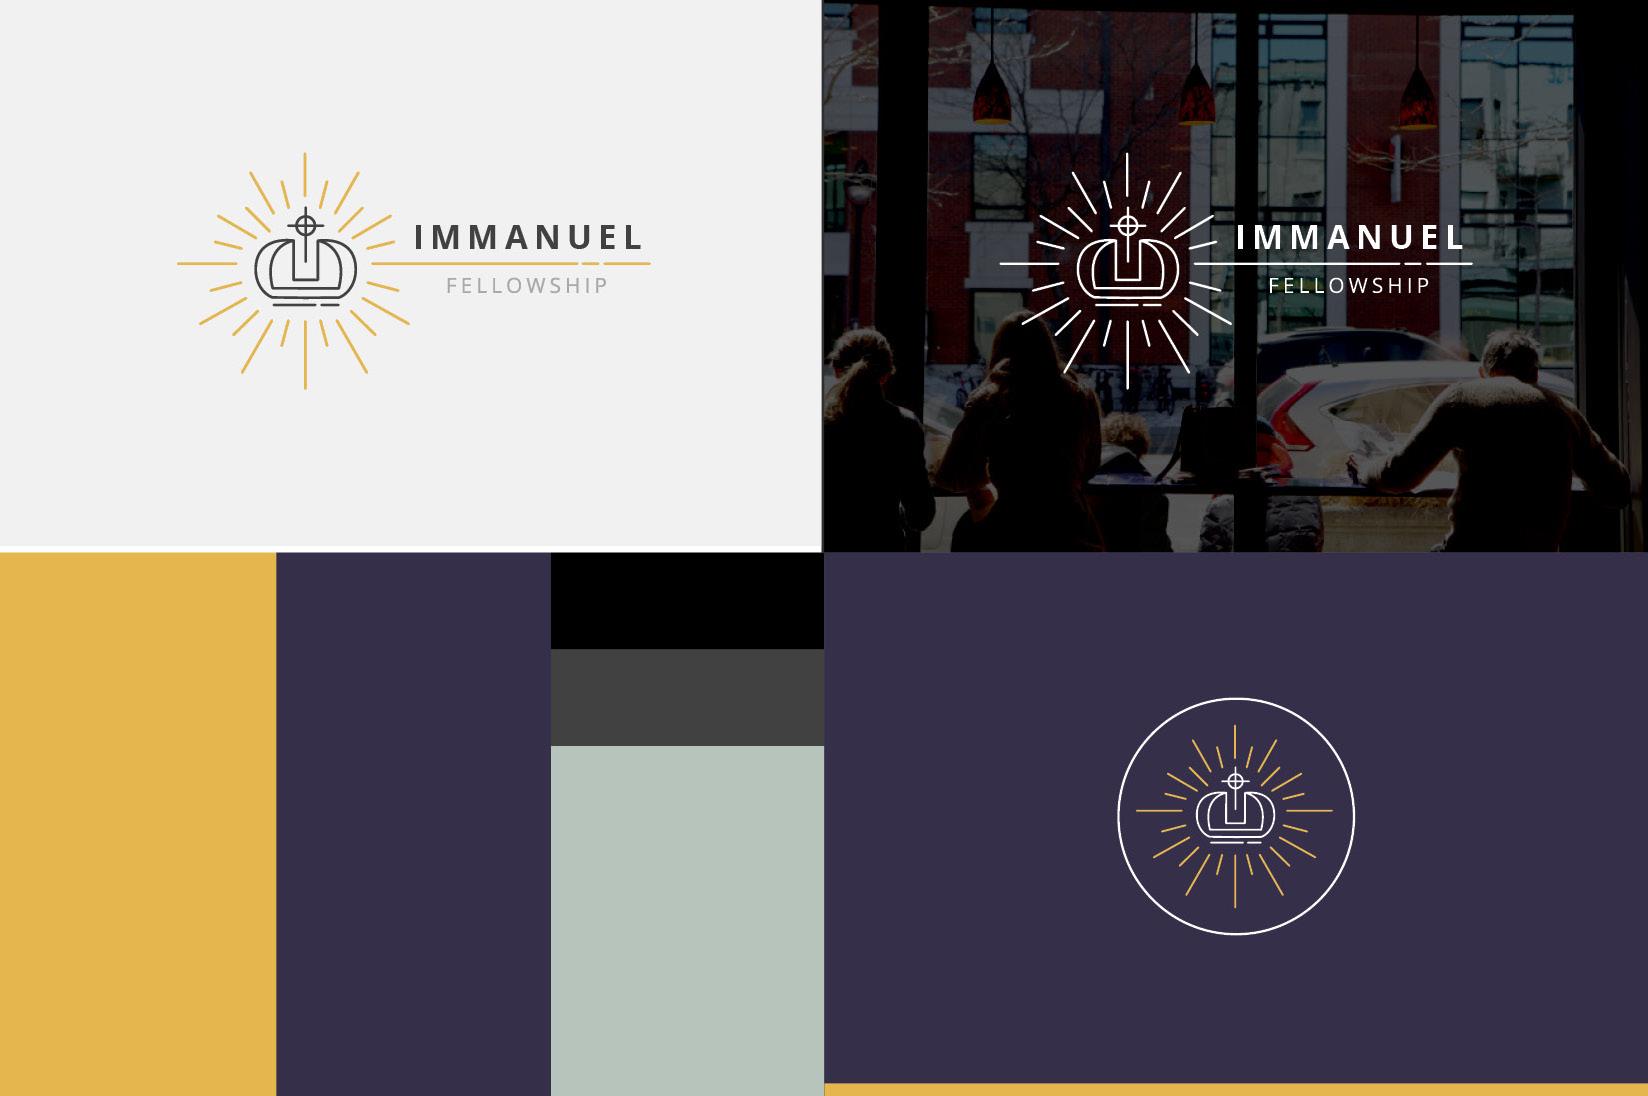 Branding_Web Images_Immanuel Fellowship33.jpg